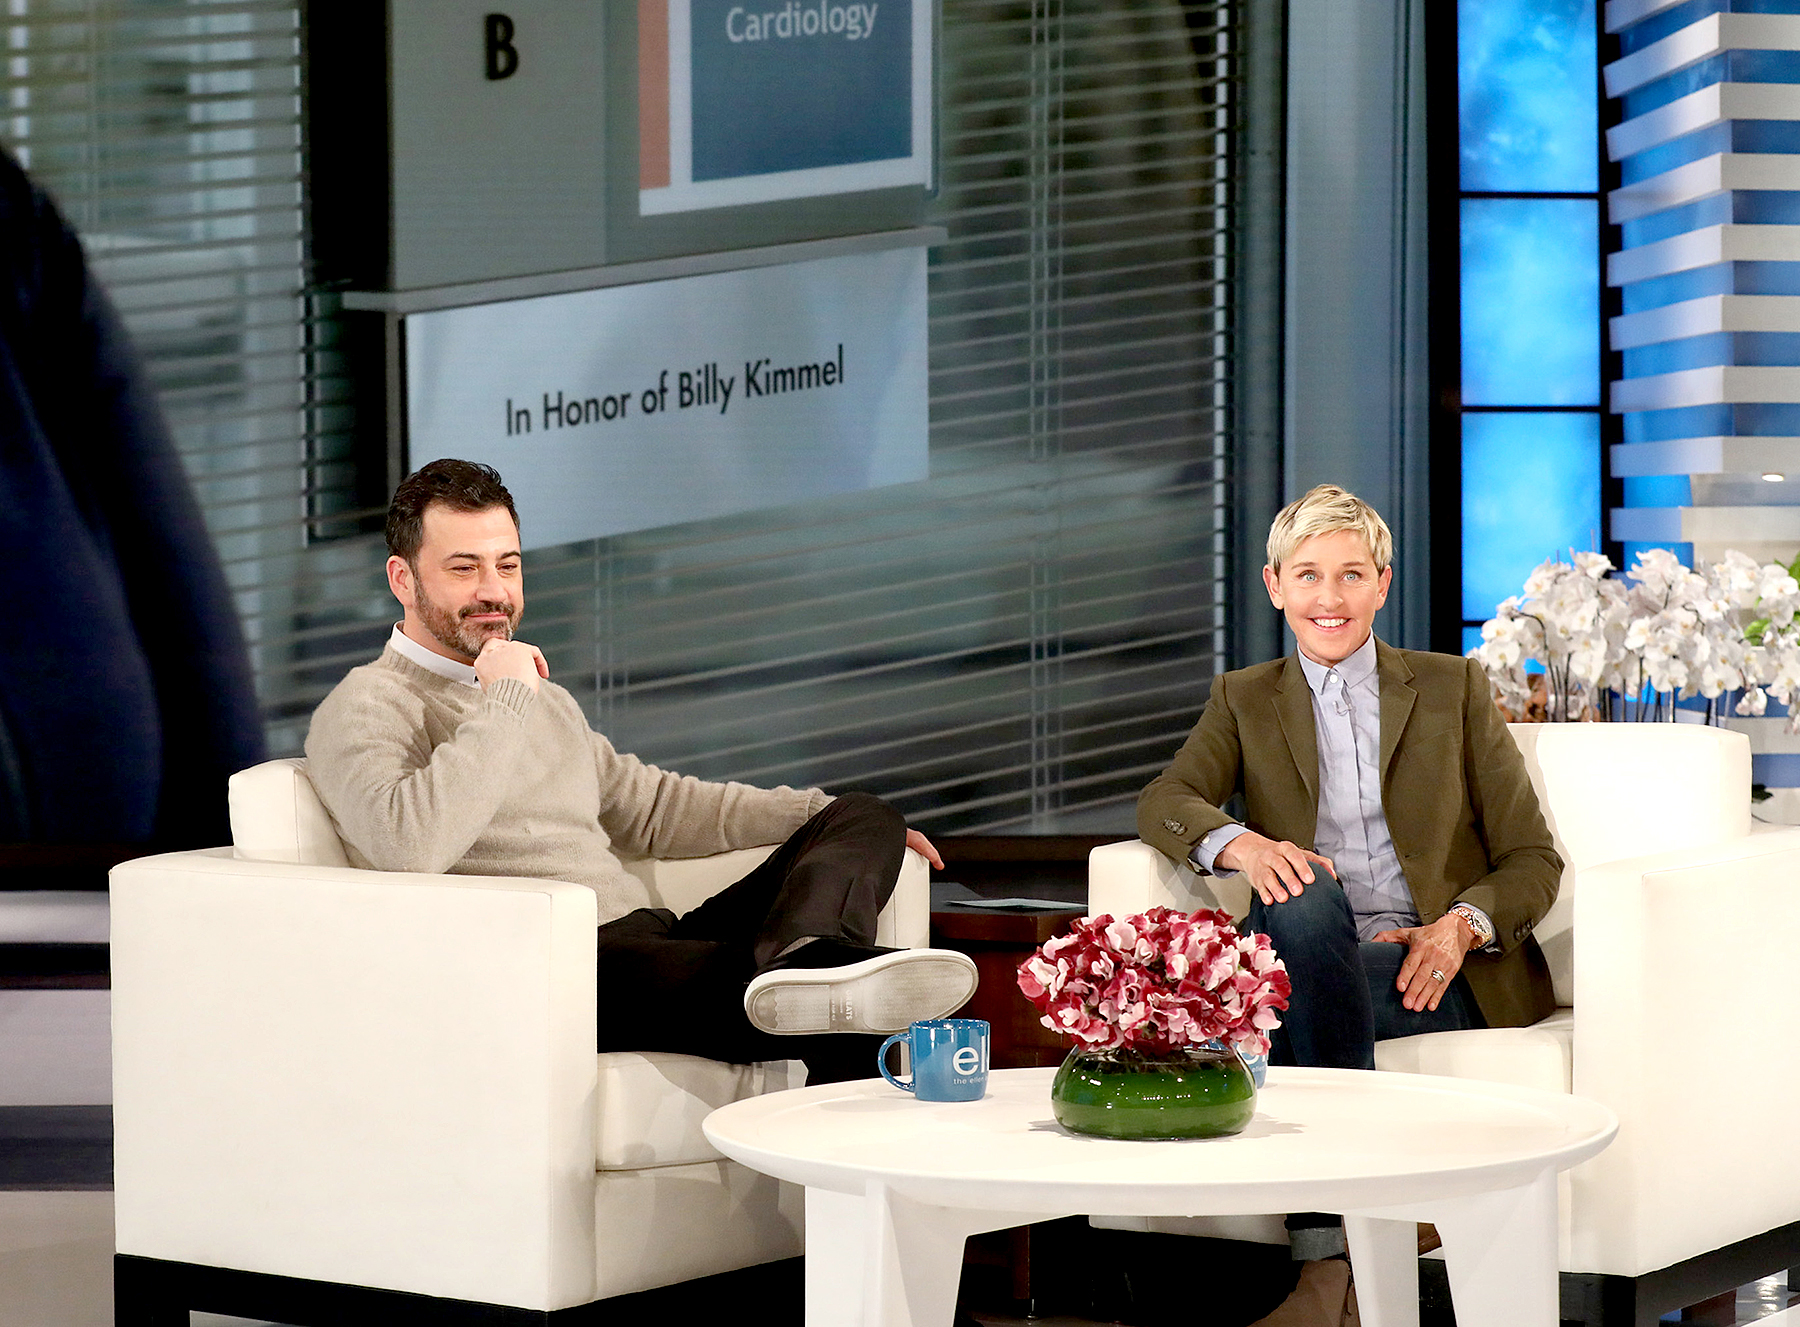 Jimmy Kimmel chokes up as Ellen DeGeneres surprises him with hospital room named after son (usmagazine.com)